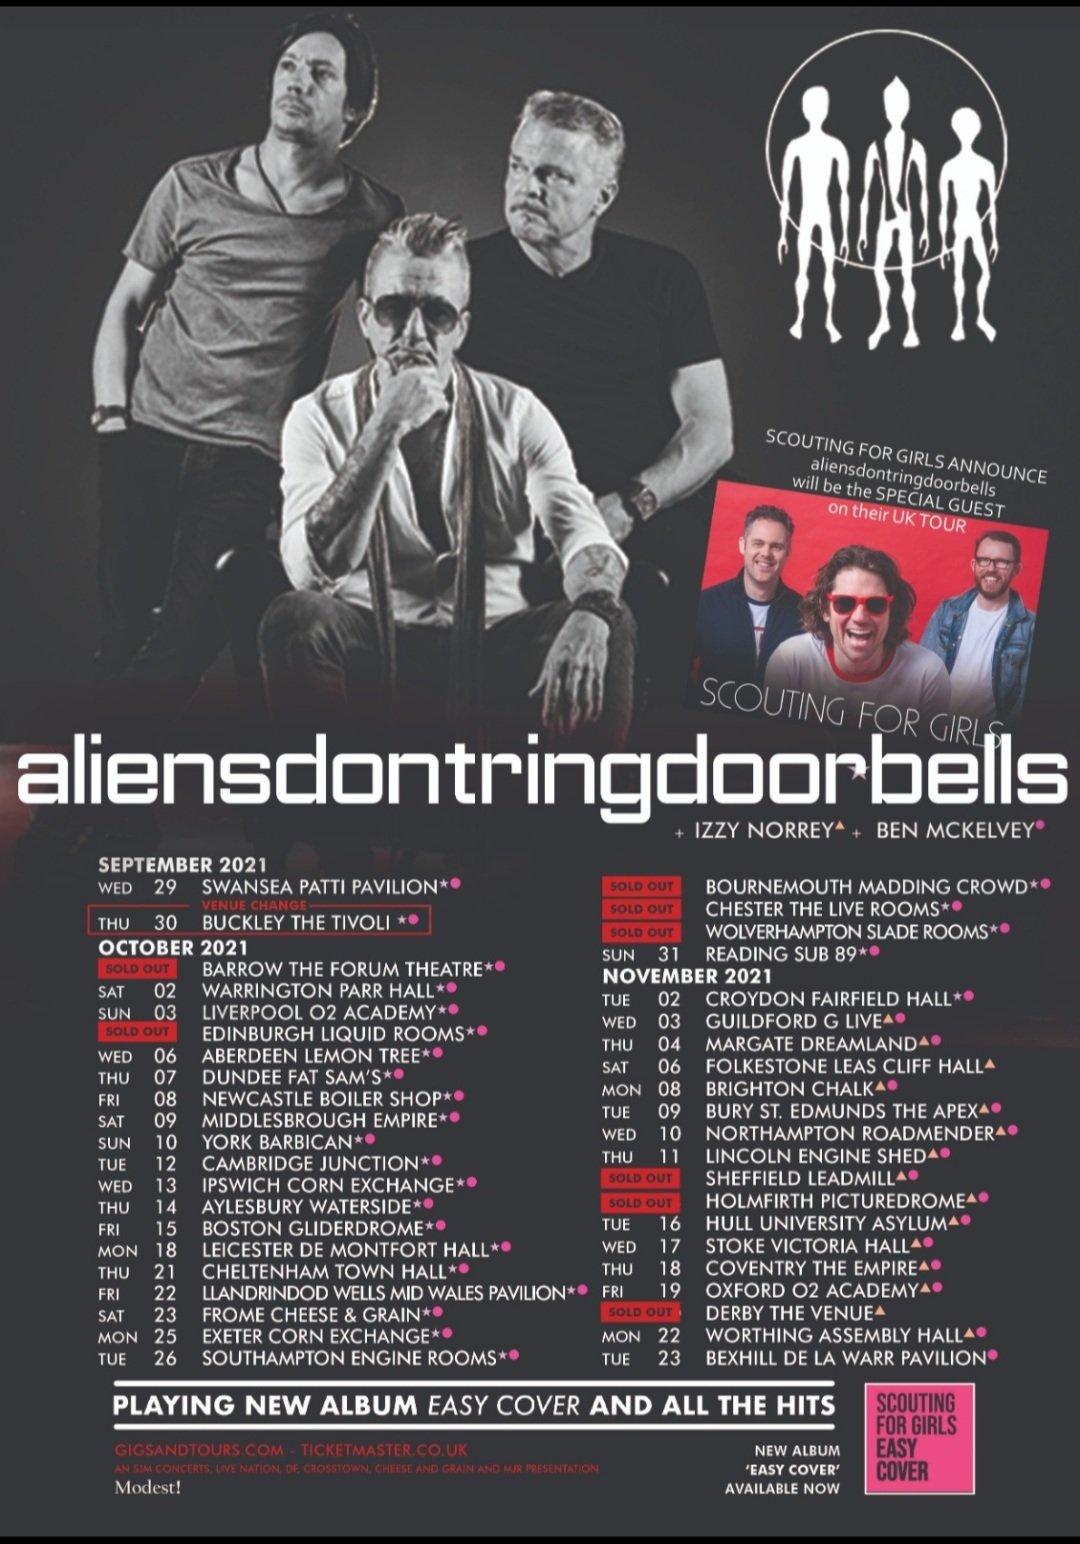 aliensdontringdoorbells tour announced